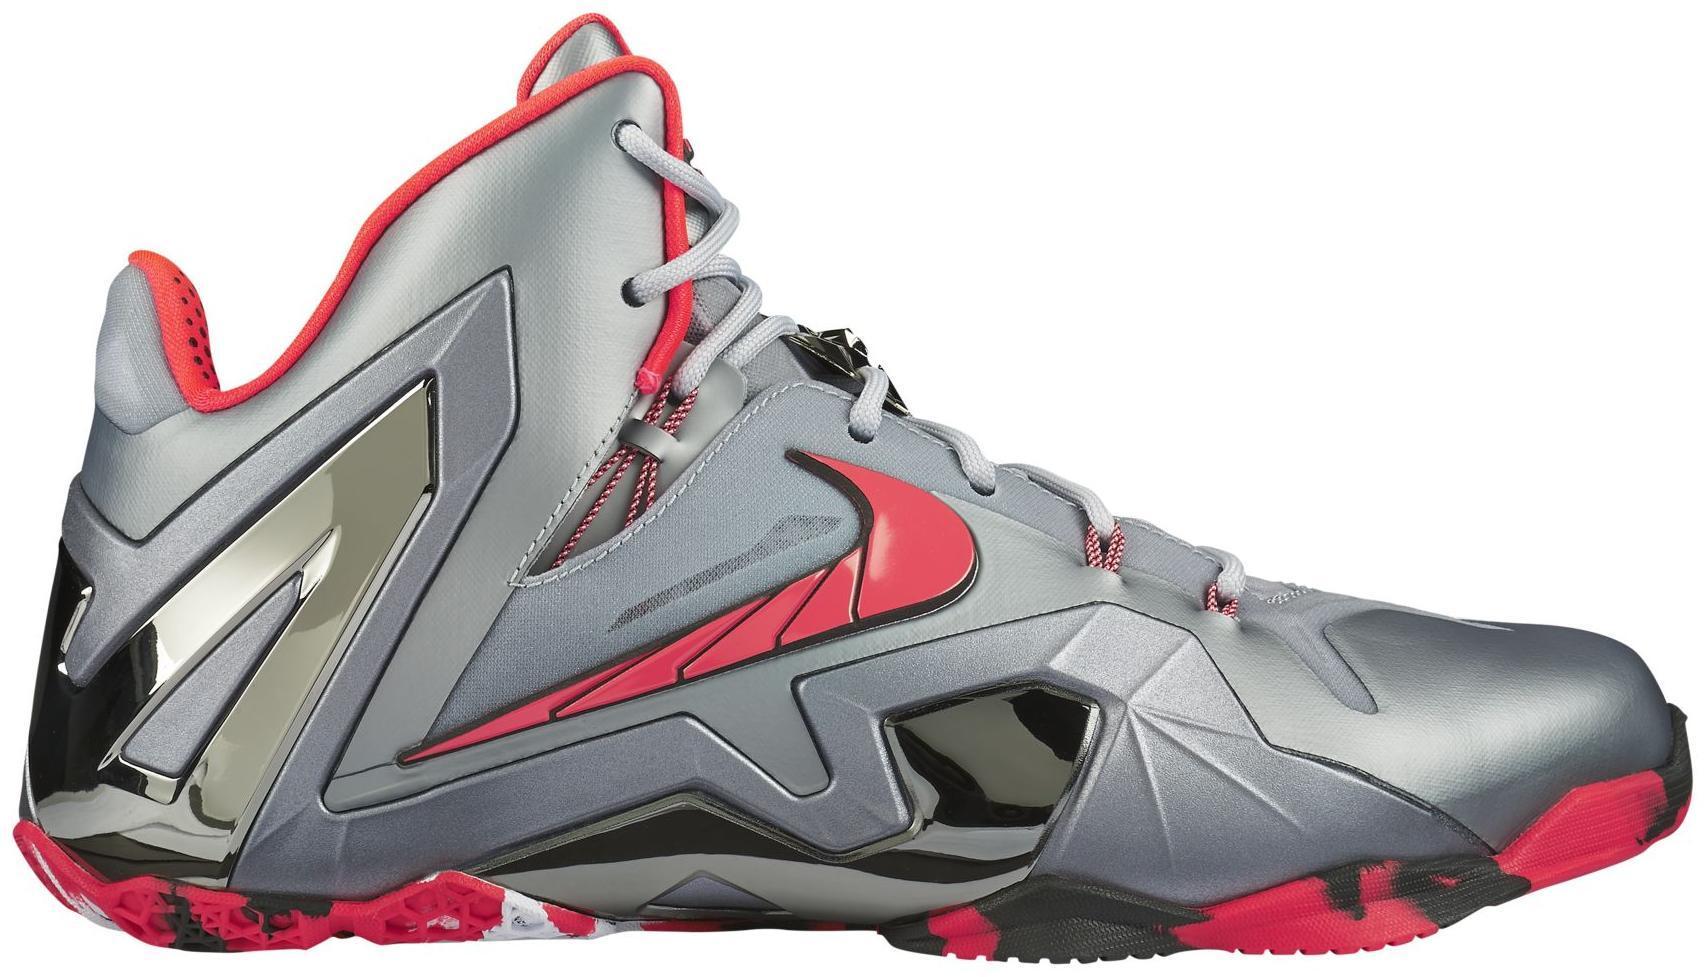 Nike LeBron 11 Elite Team - 642846-001